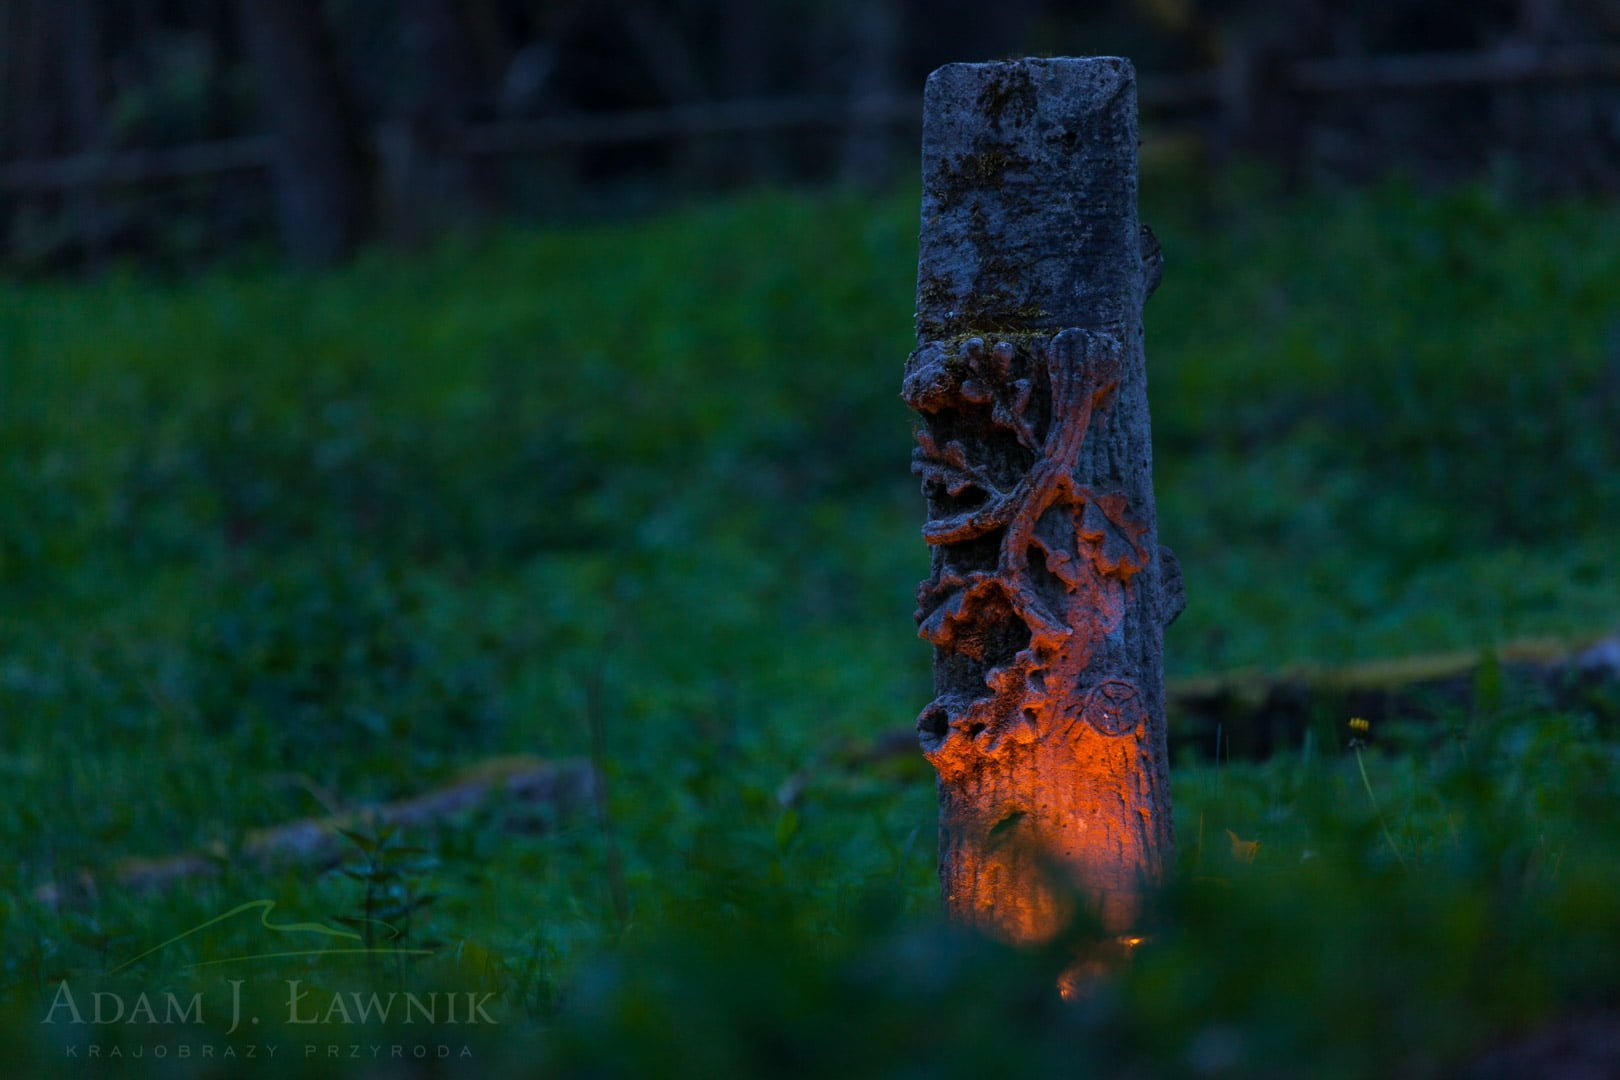 Drawa National Park, Poland 1005-00695C